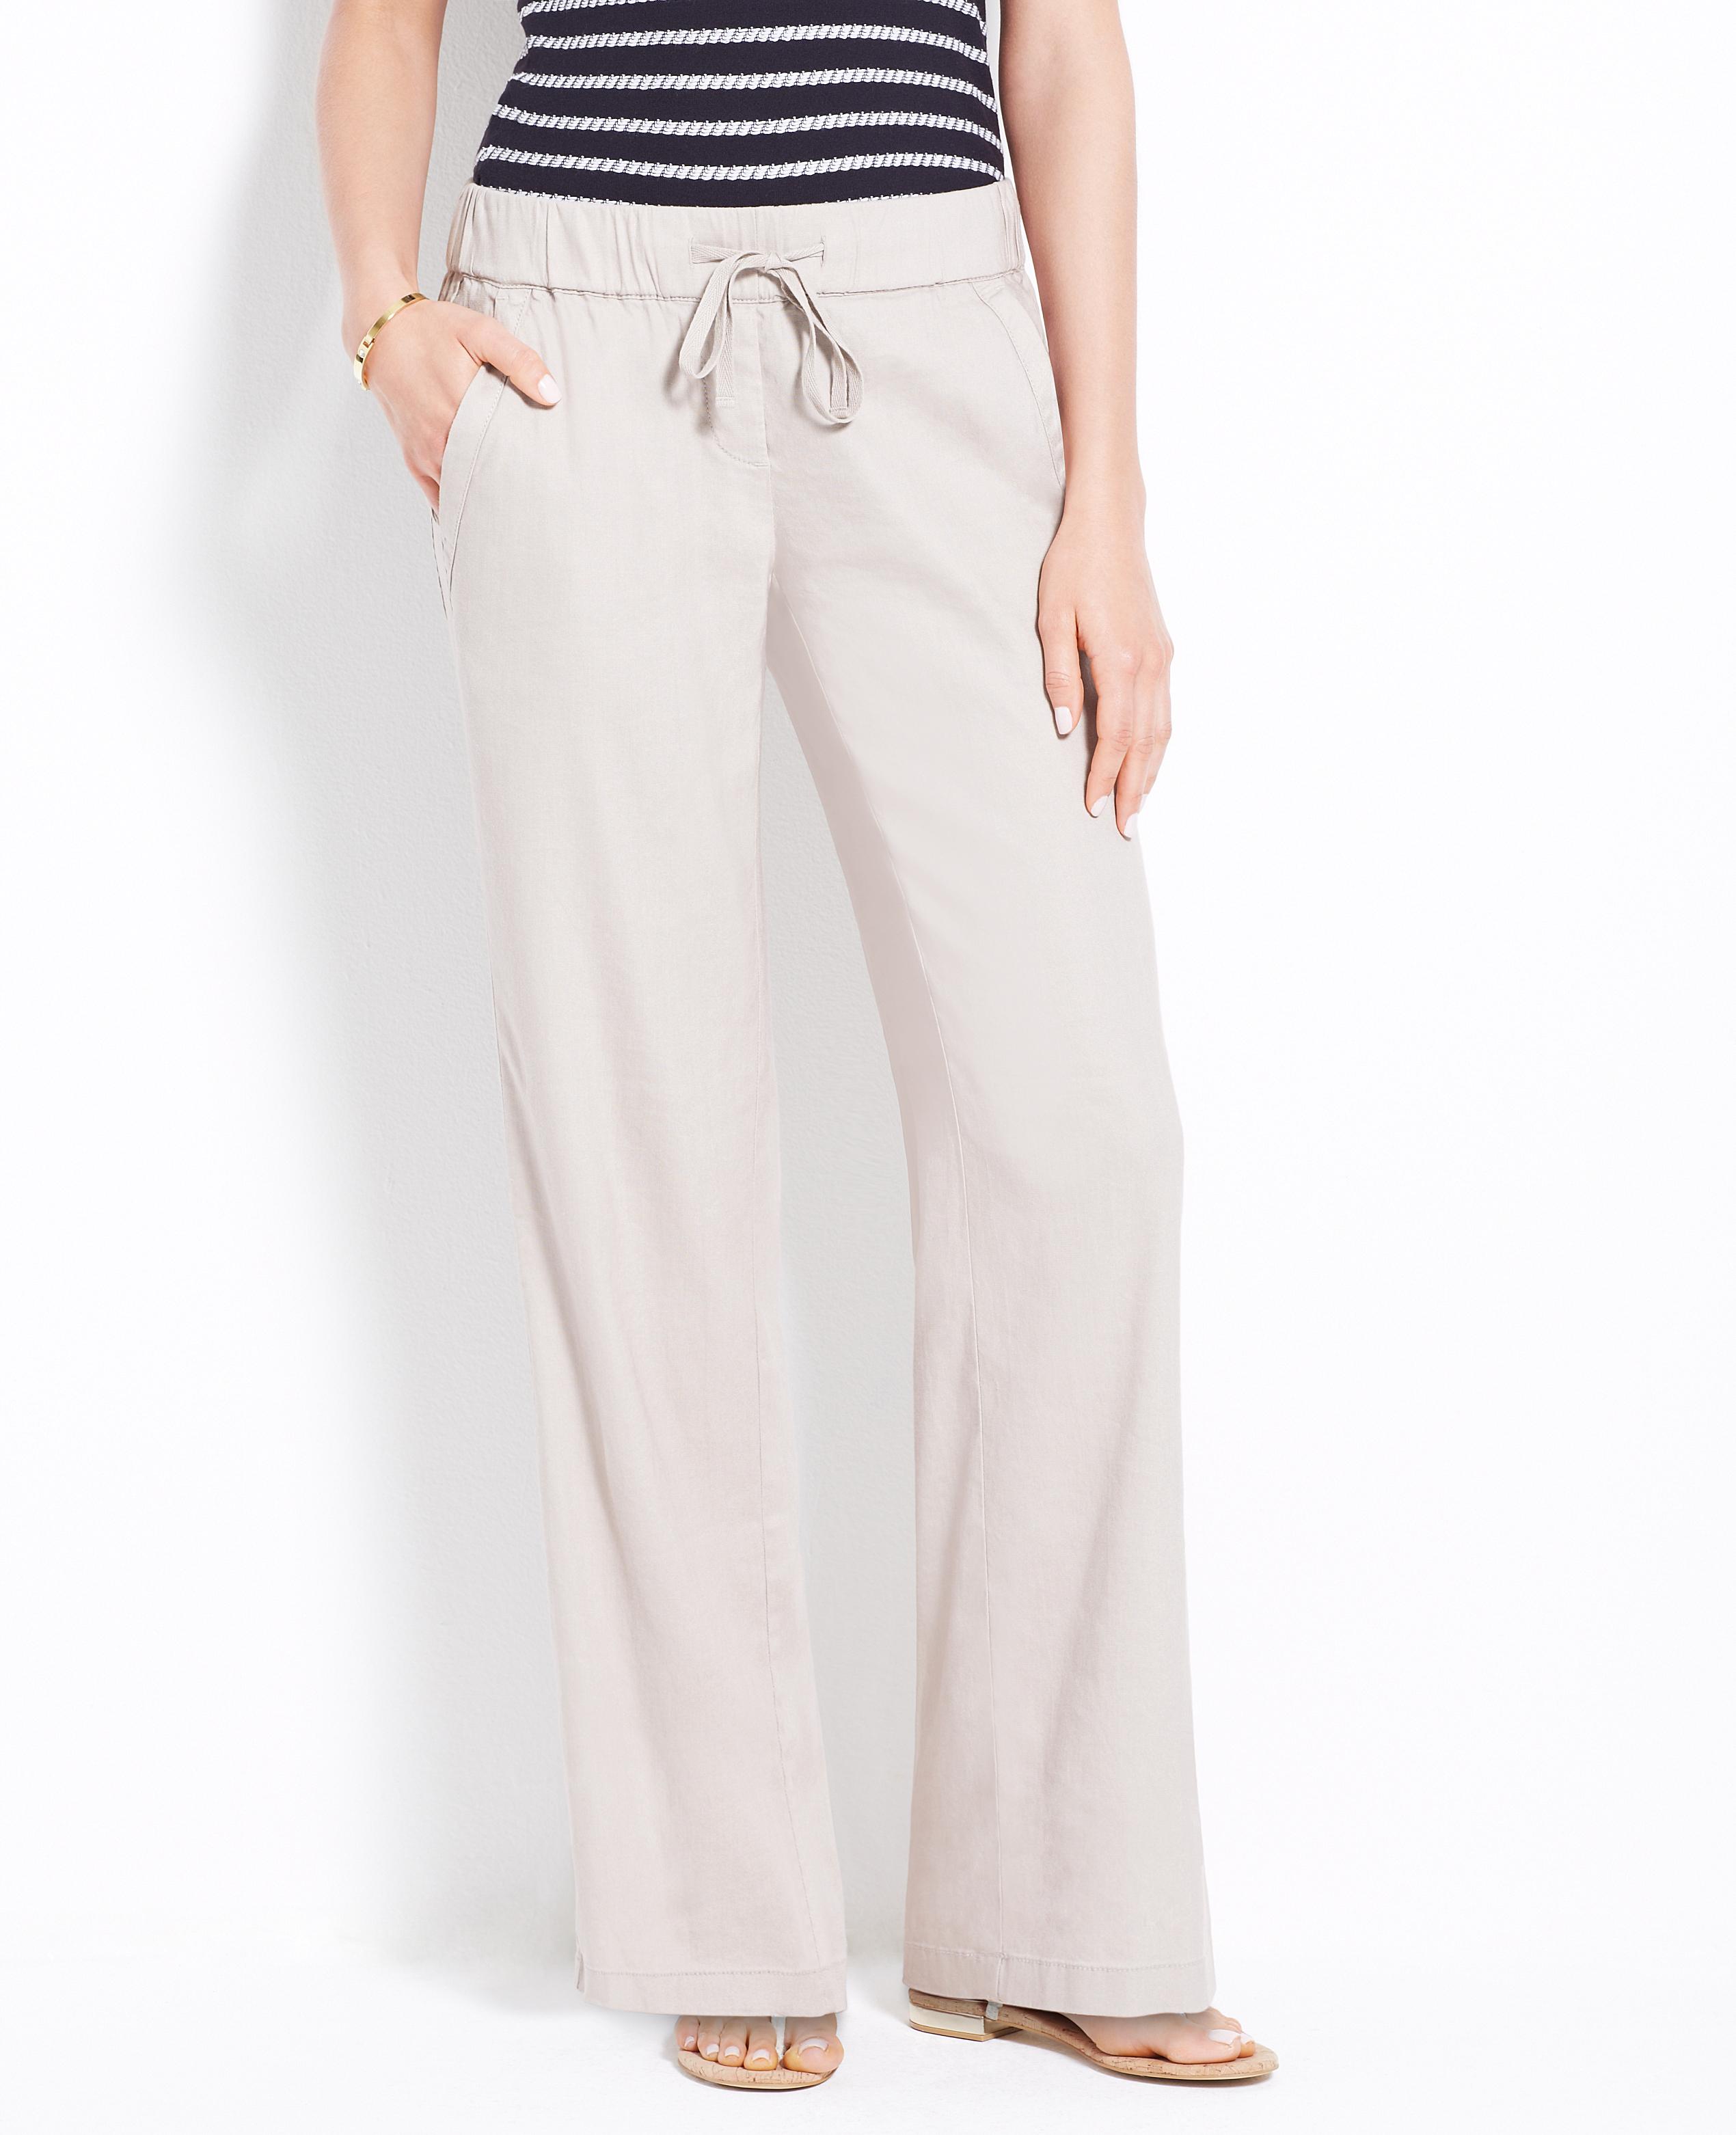 de7edbe1d50 Lyst - Ann Taylor Linen Blend Drawstring Pants in Natural